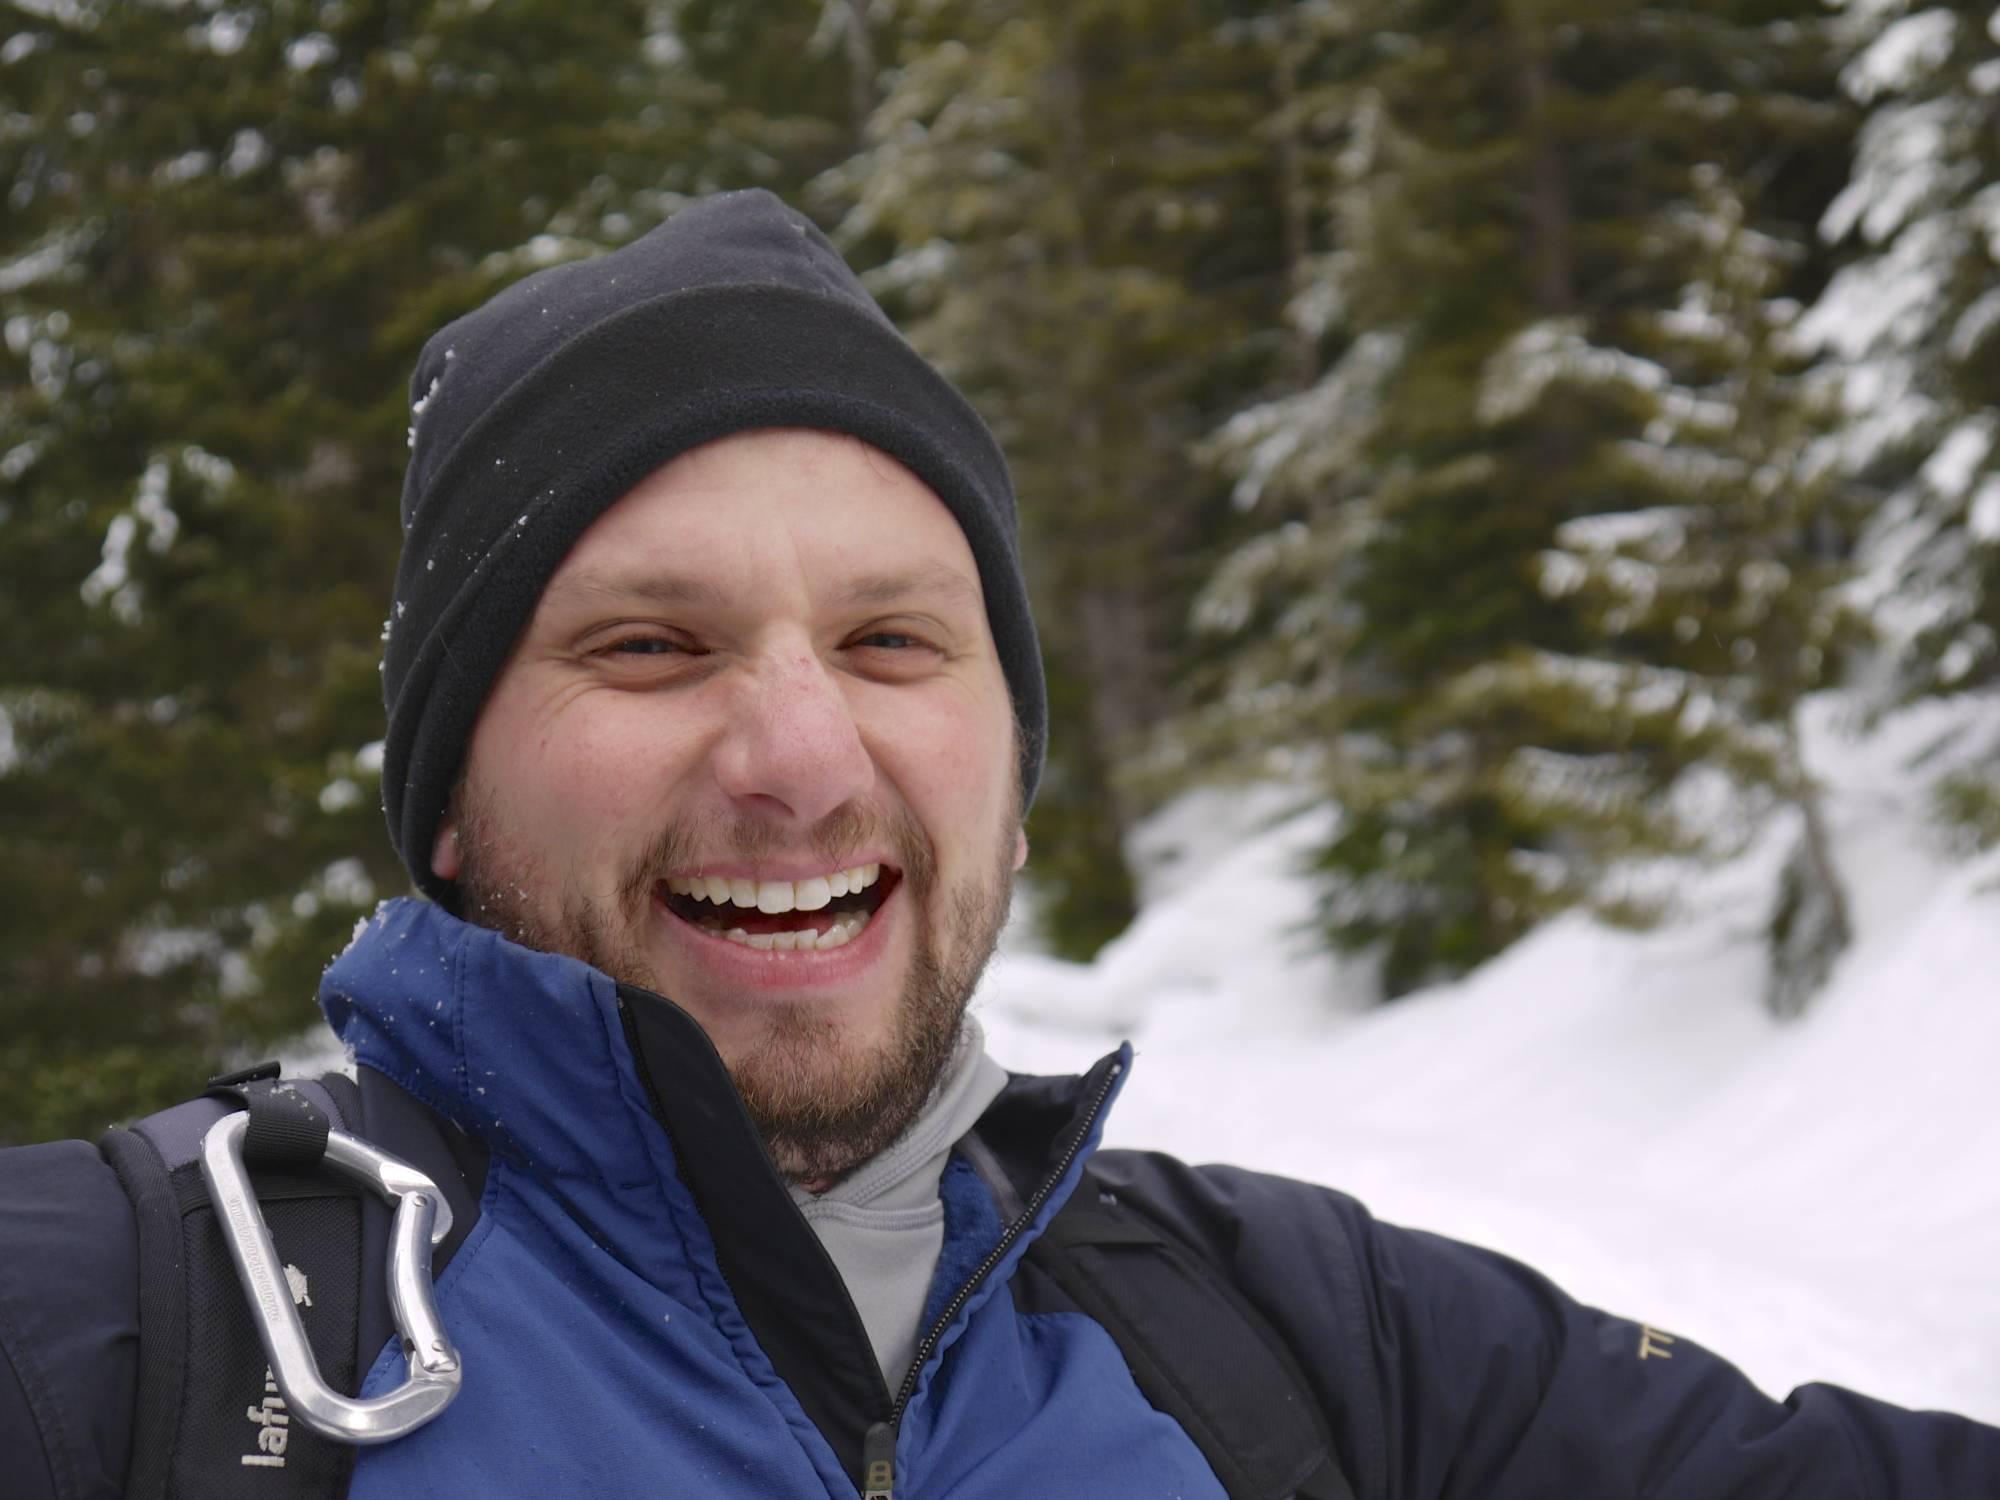 Our Wilderness Survival Friend, Aaron (He sure looks happy...)